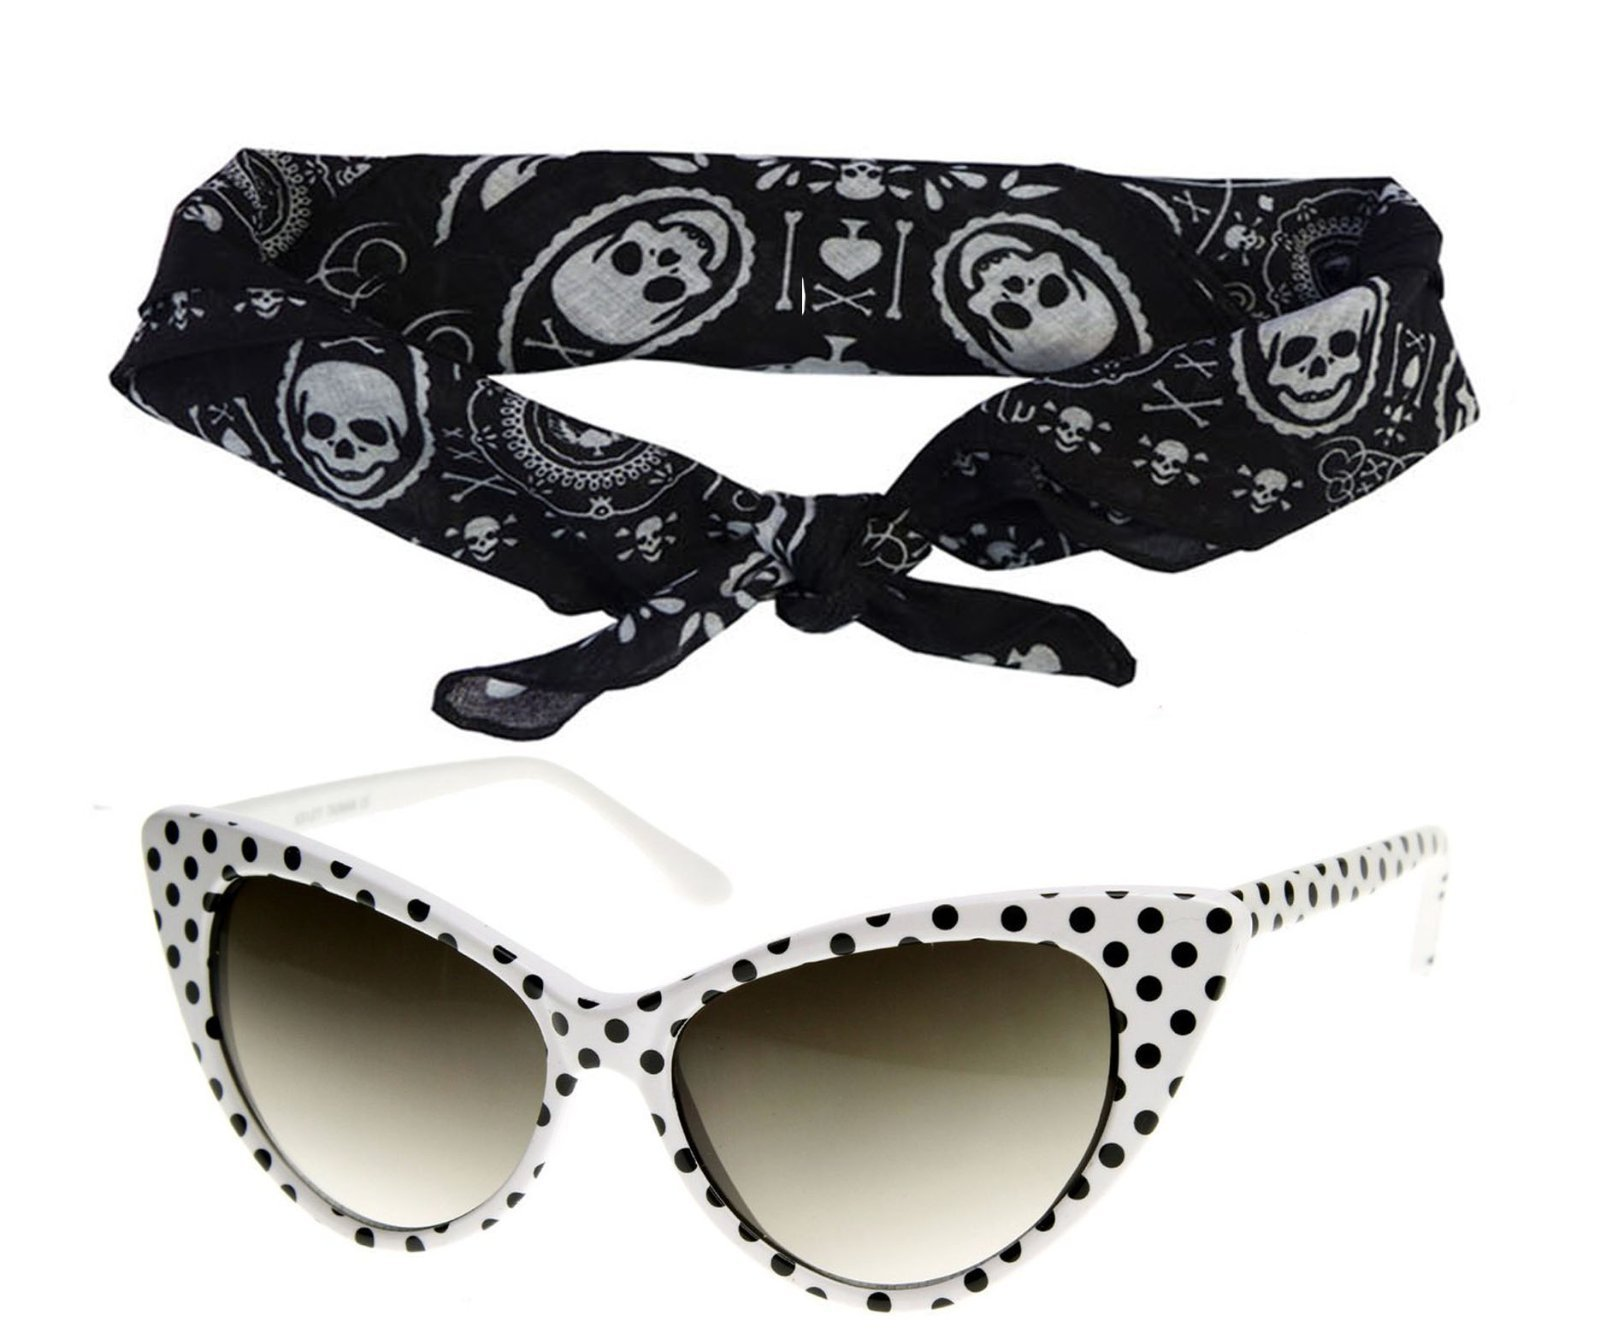 50s Polka Dot Cat Eye White Sunglasses Black Bandana Tie Headband Set